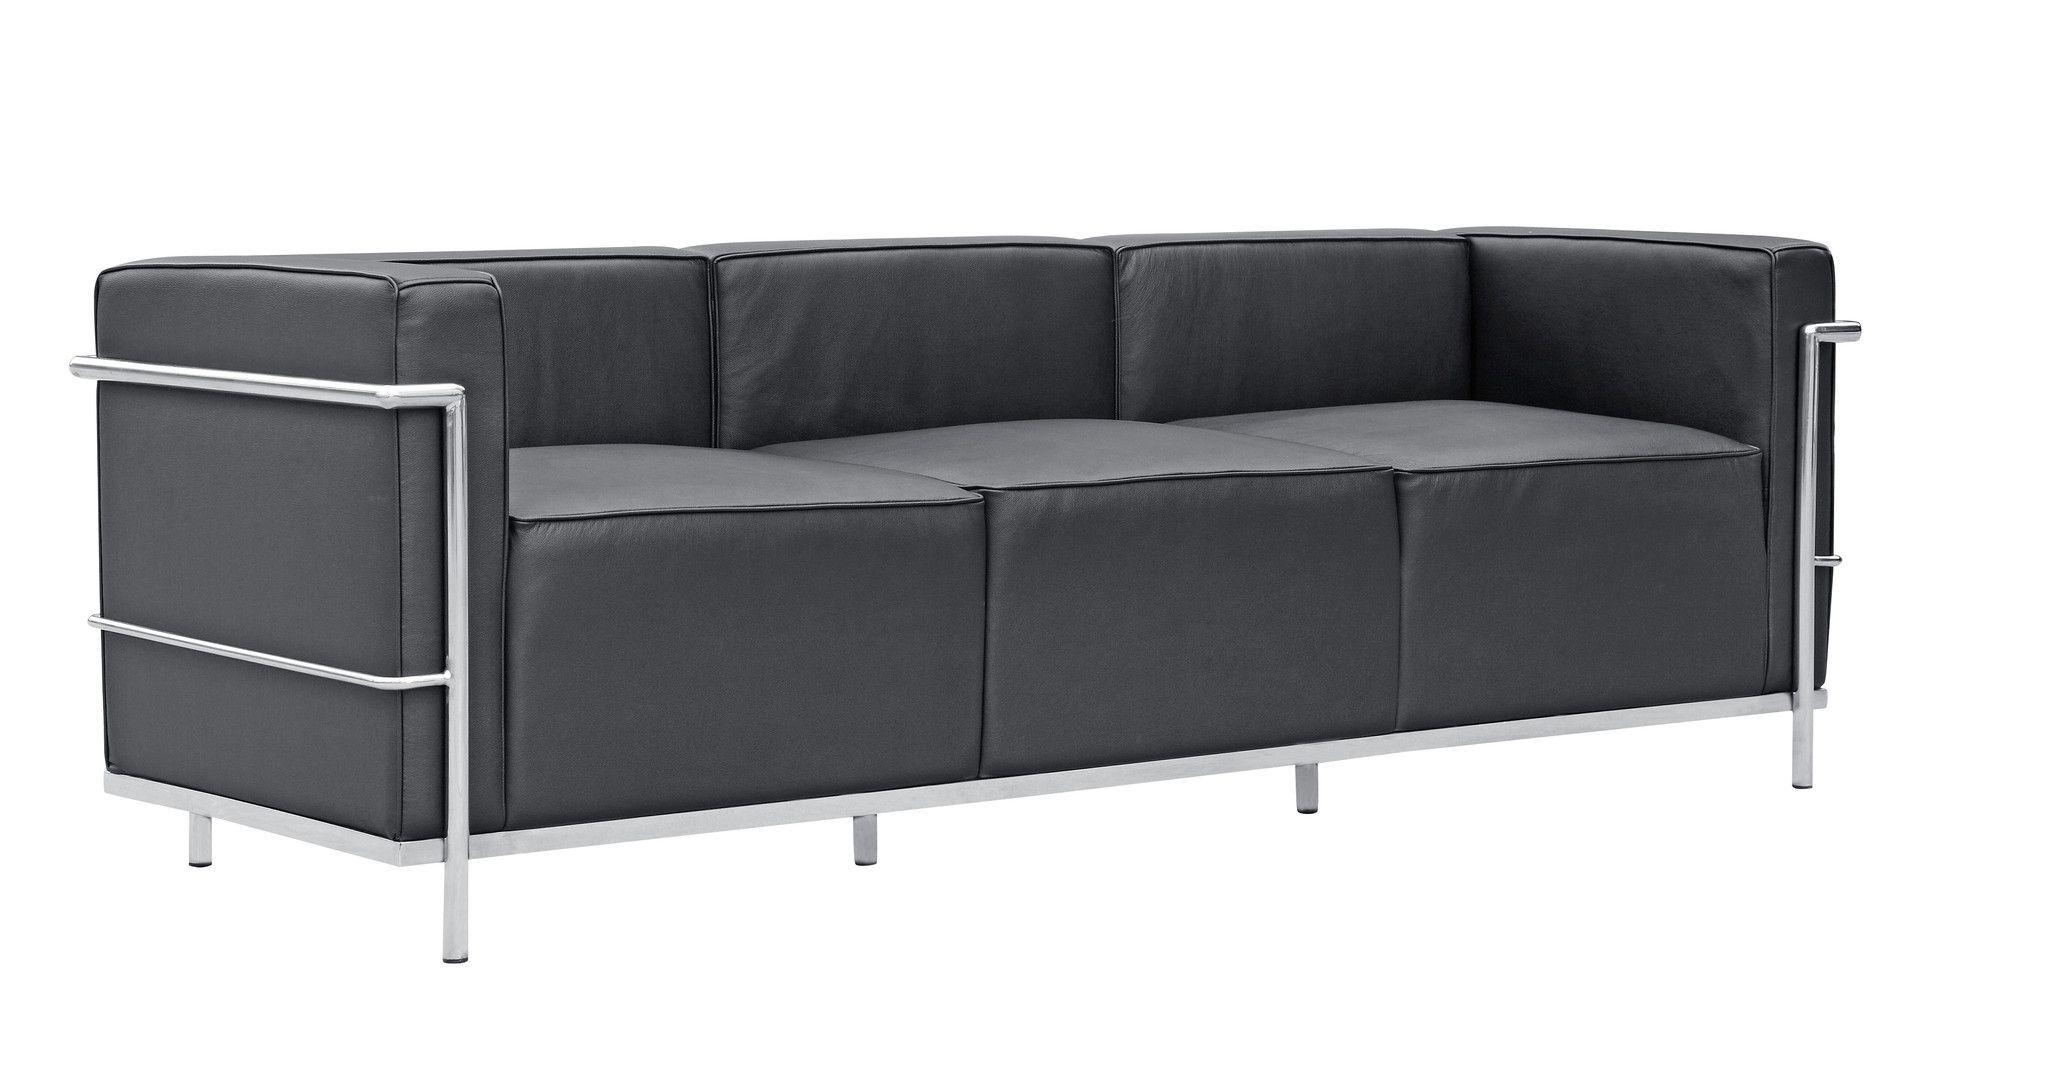 Le Corbusier Lc3 Style Leather Sofa Black Best Leather Sofa Leather Sofa Sofa